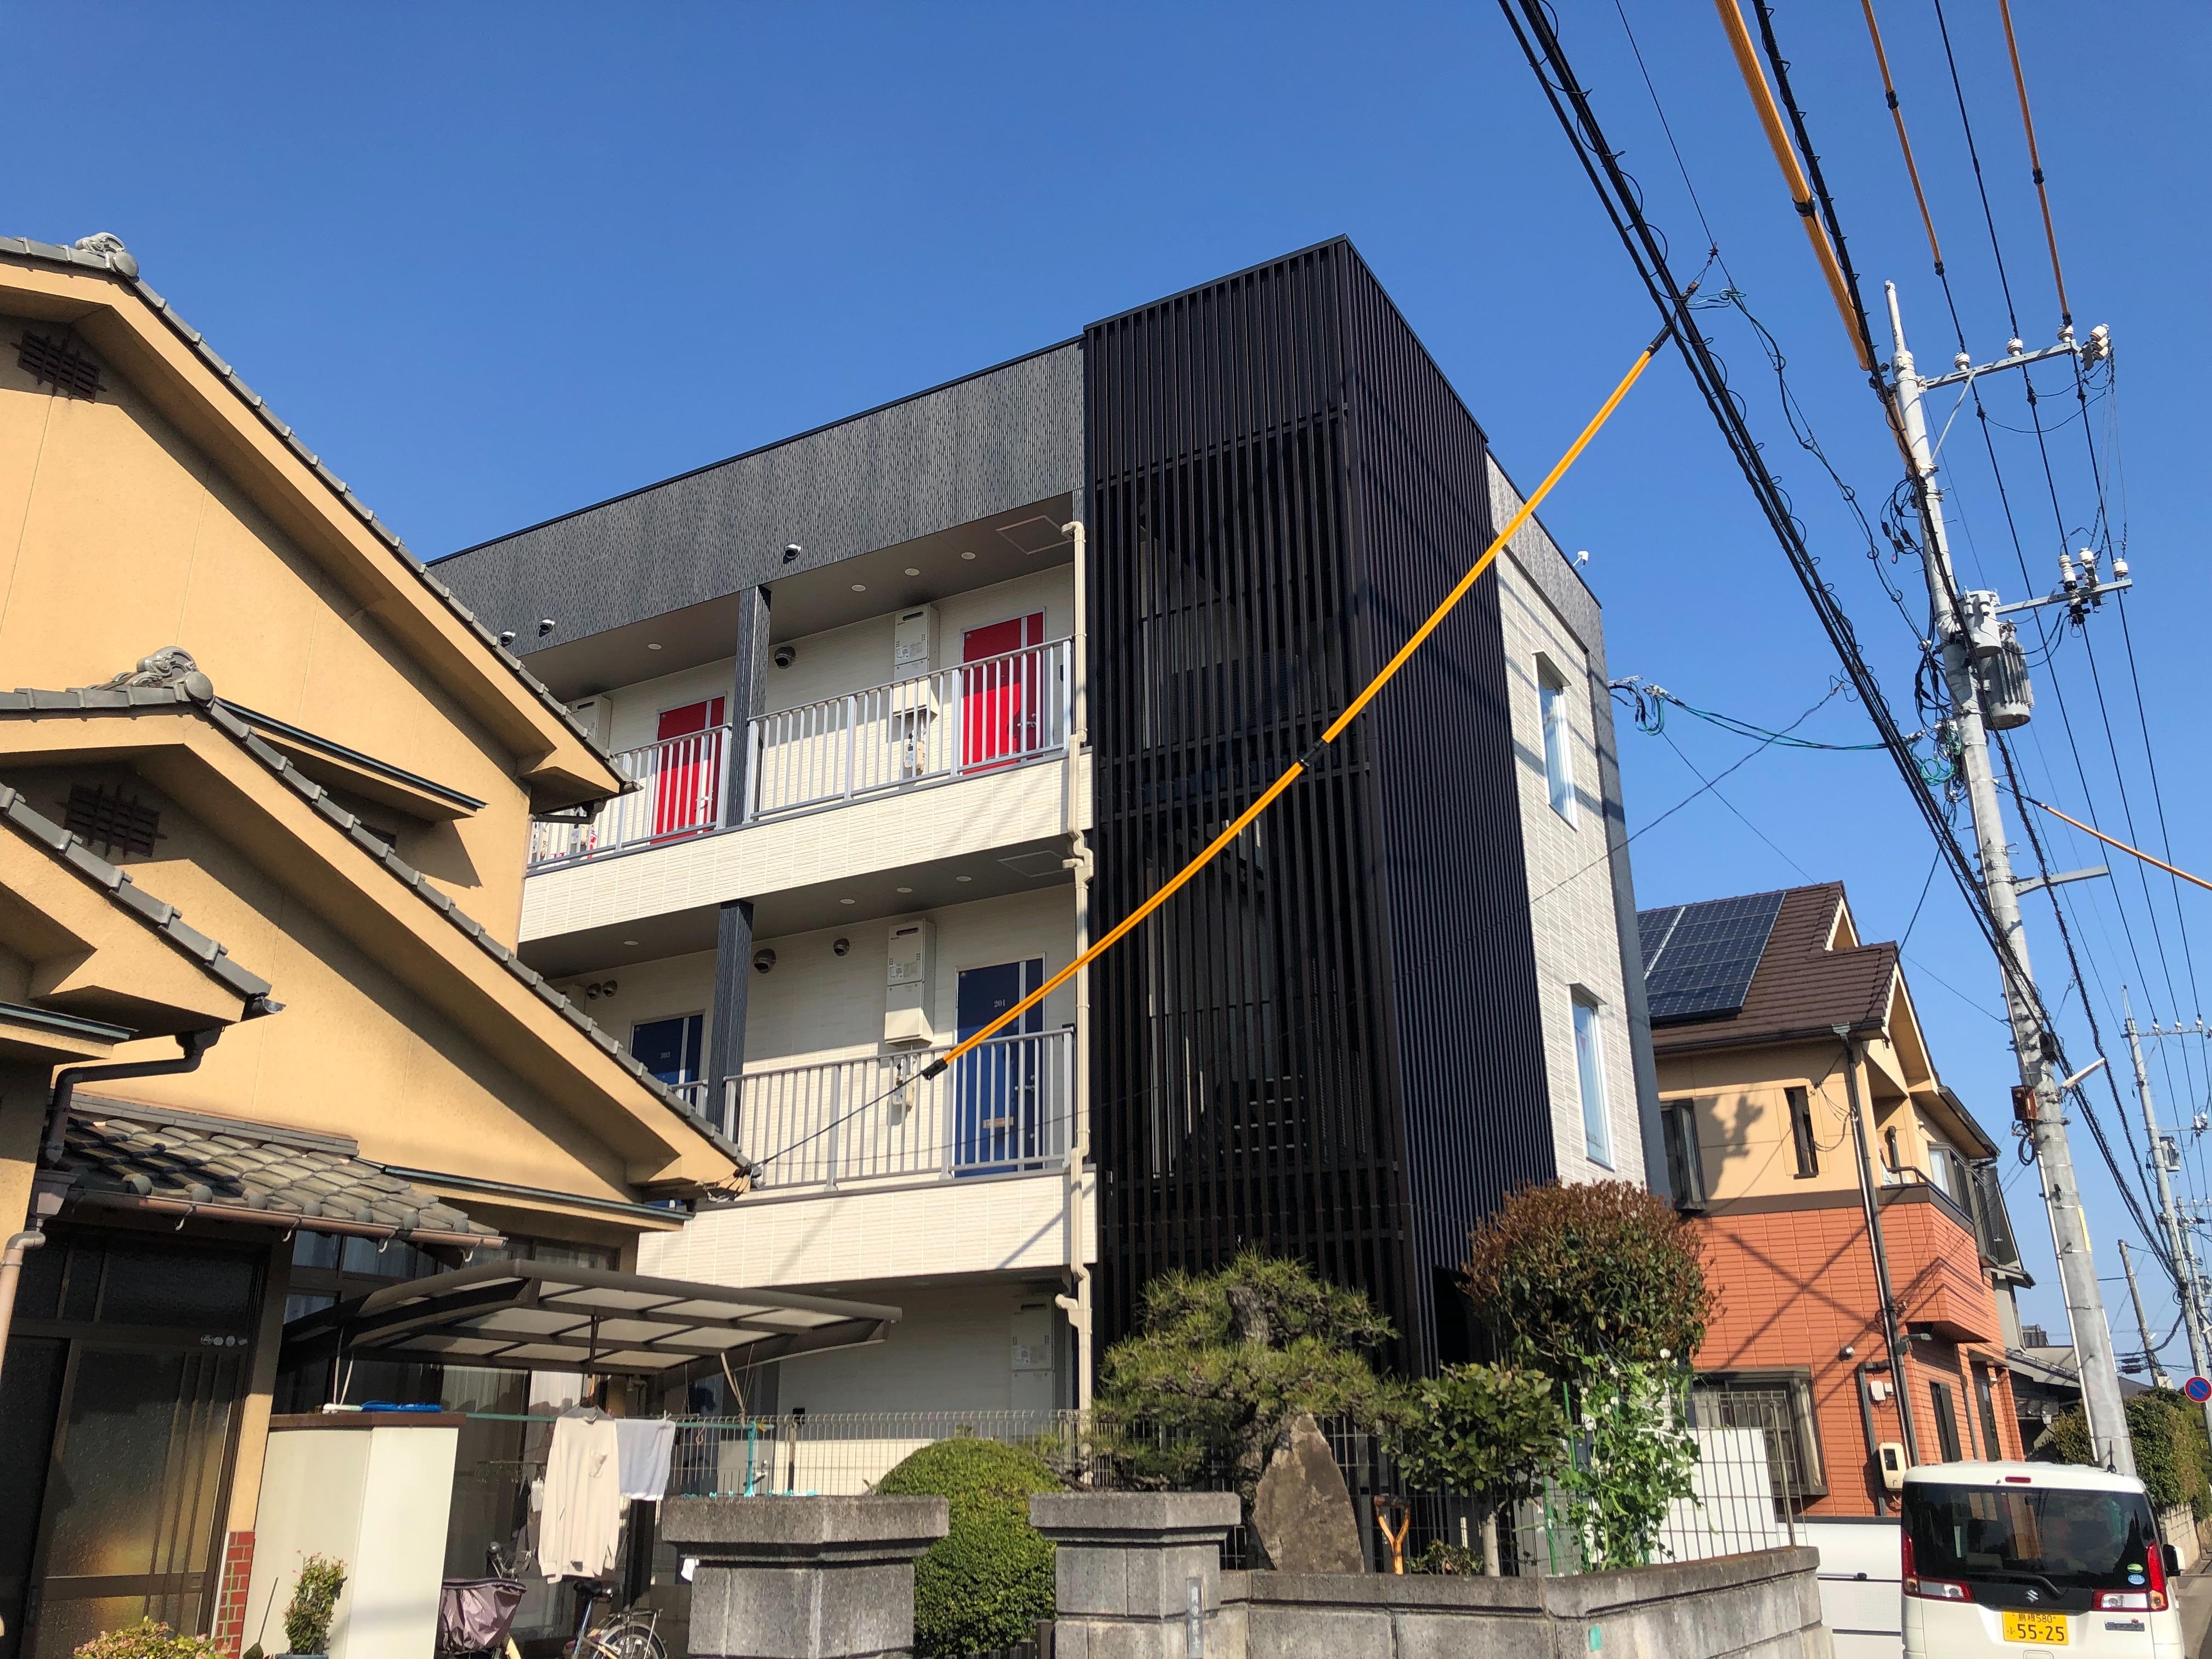 f:id:masanori-kato1972:20190404085433j:image